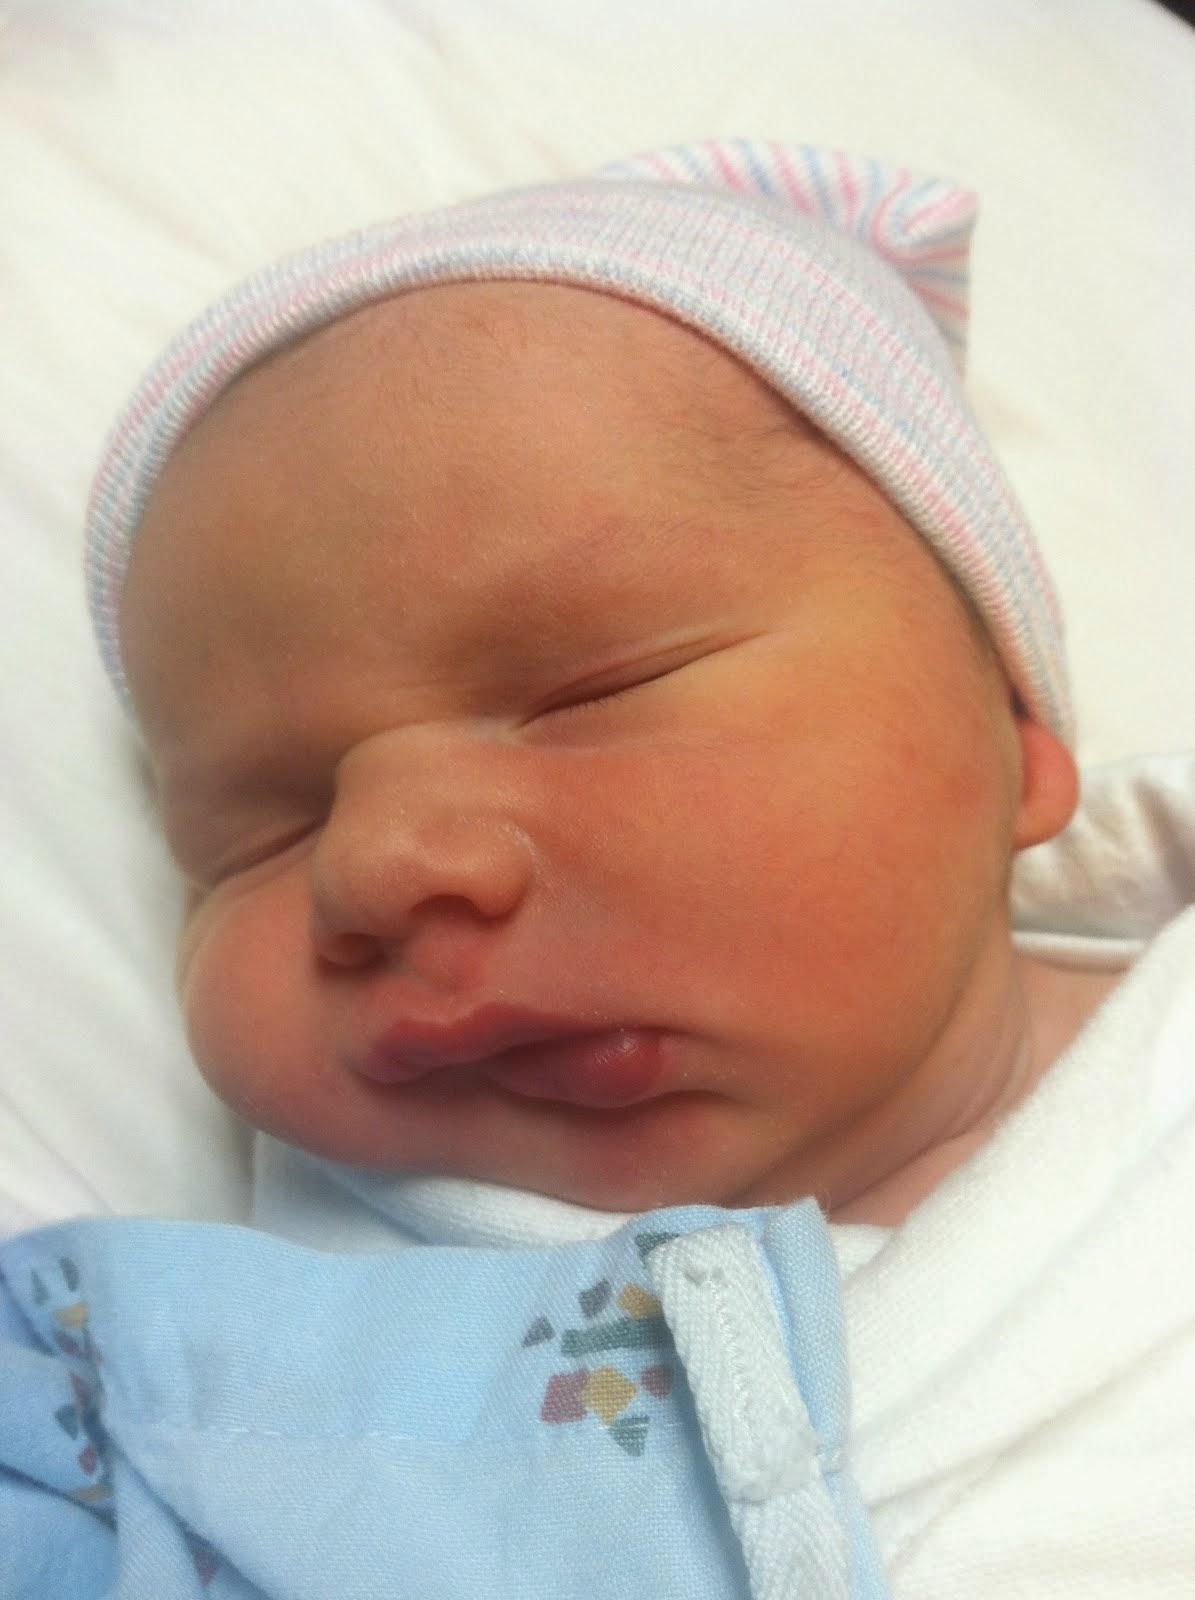 Baby #5 - Awaiting a nickname!